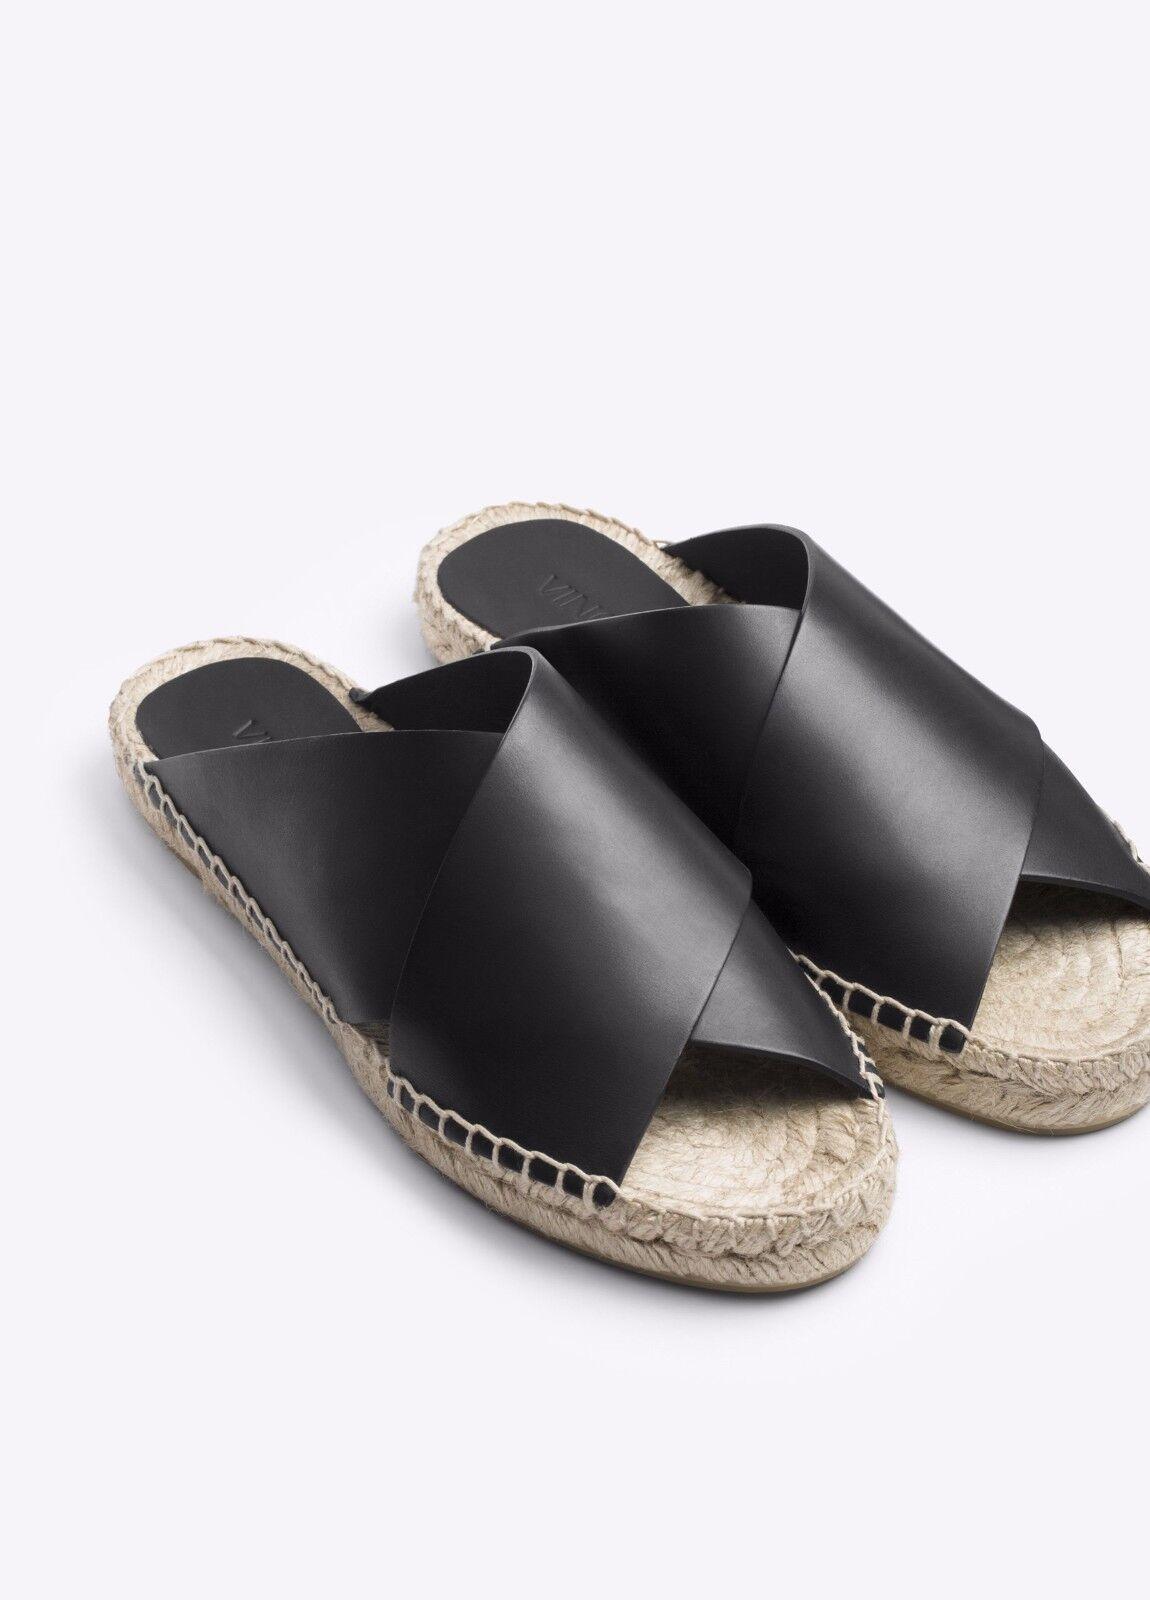 NIB Vince Castel Leather Crisscross Flat Espadrille Sandal Slide Black Sz 5  225